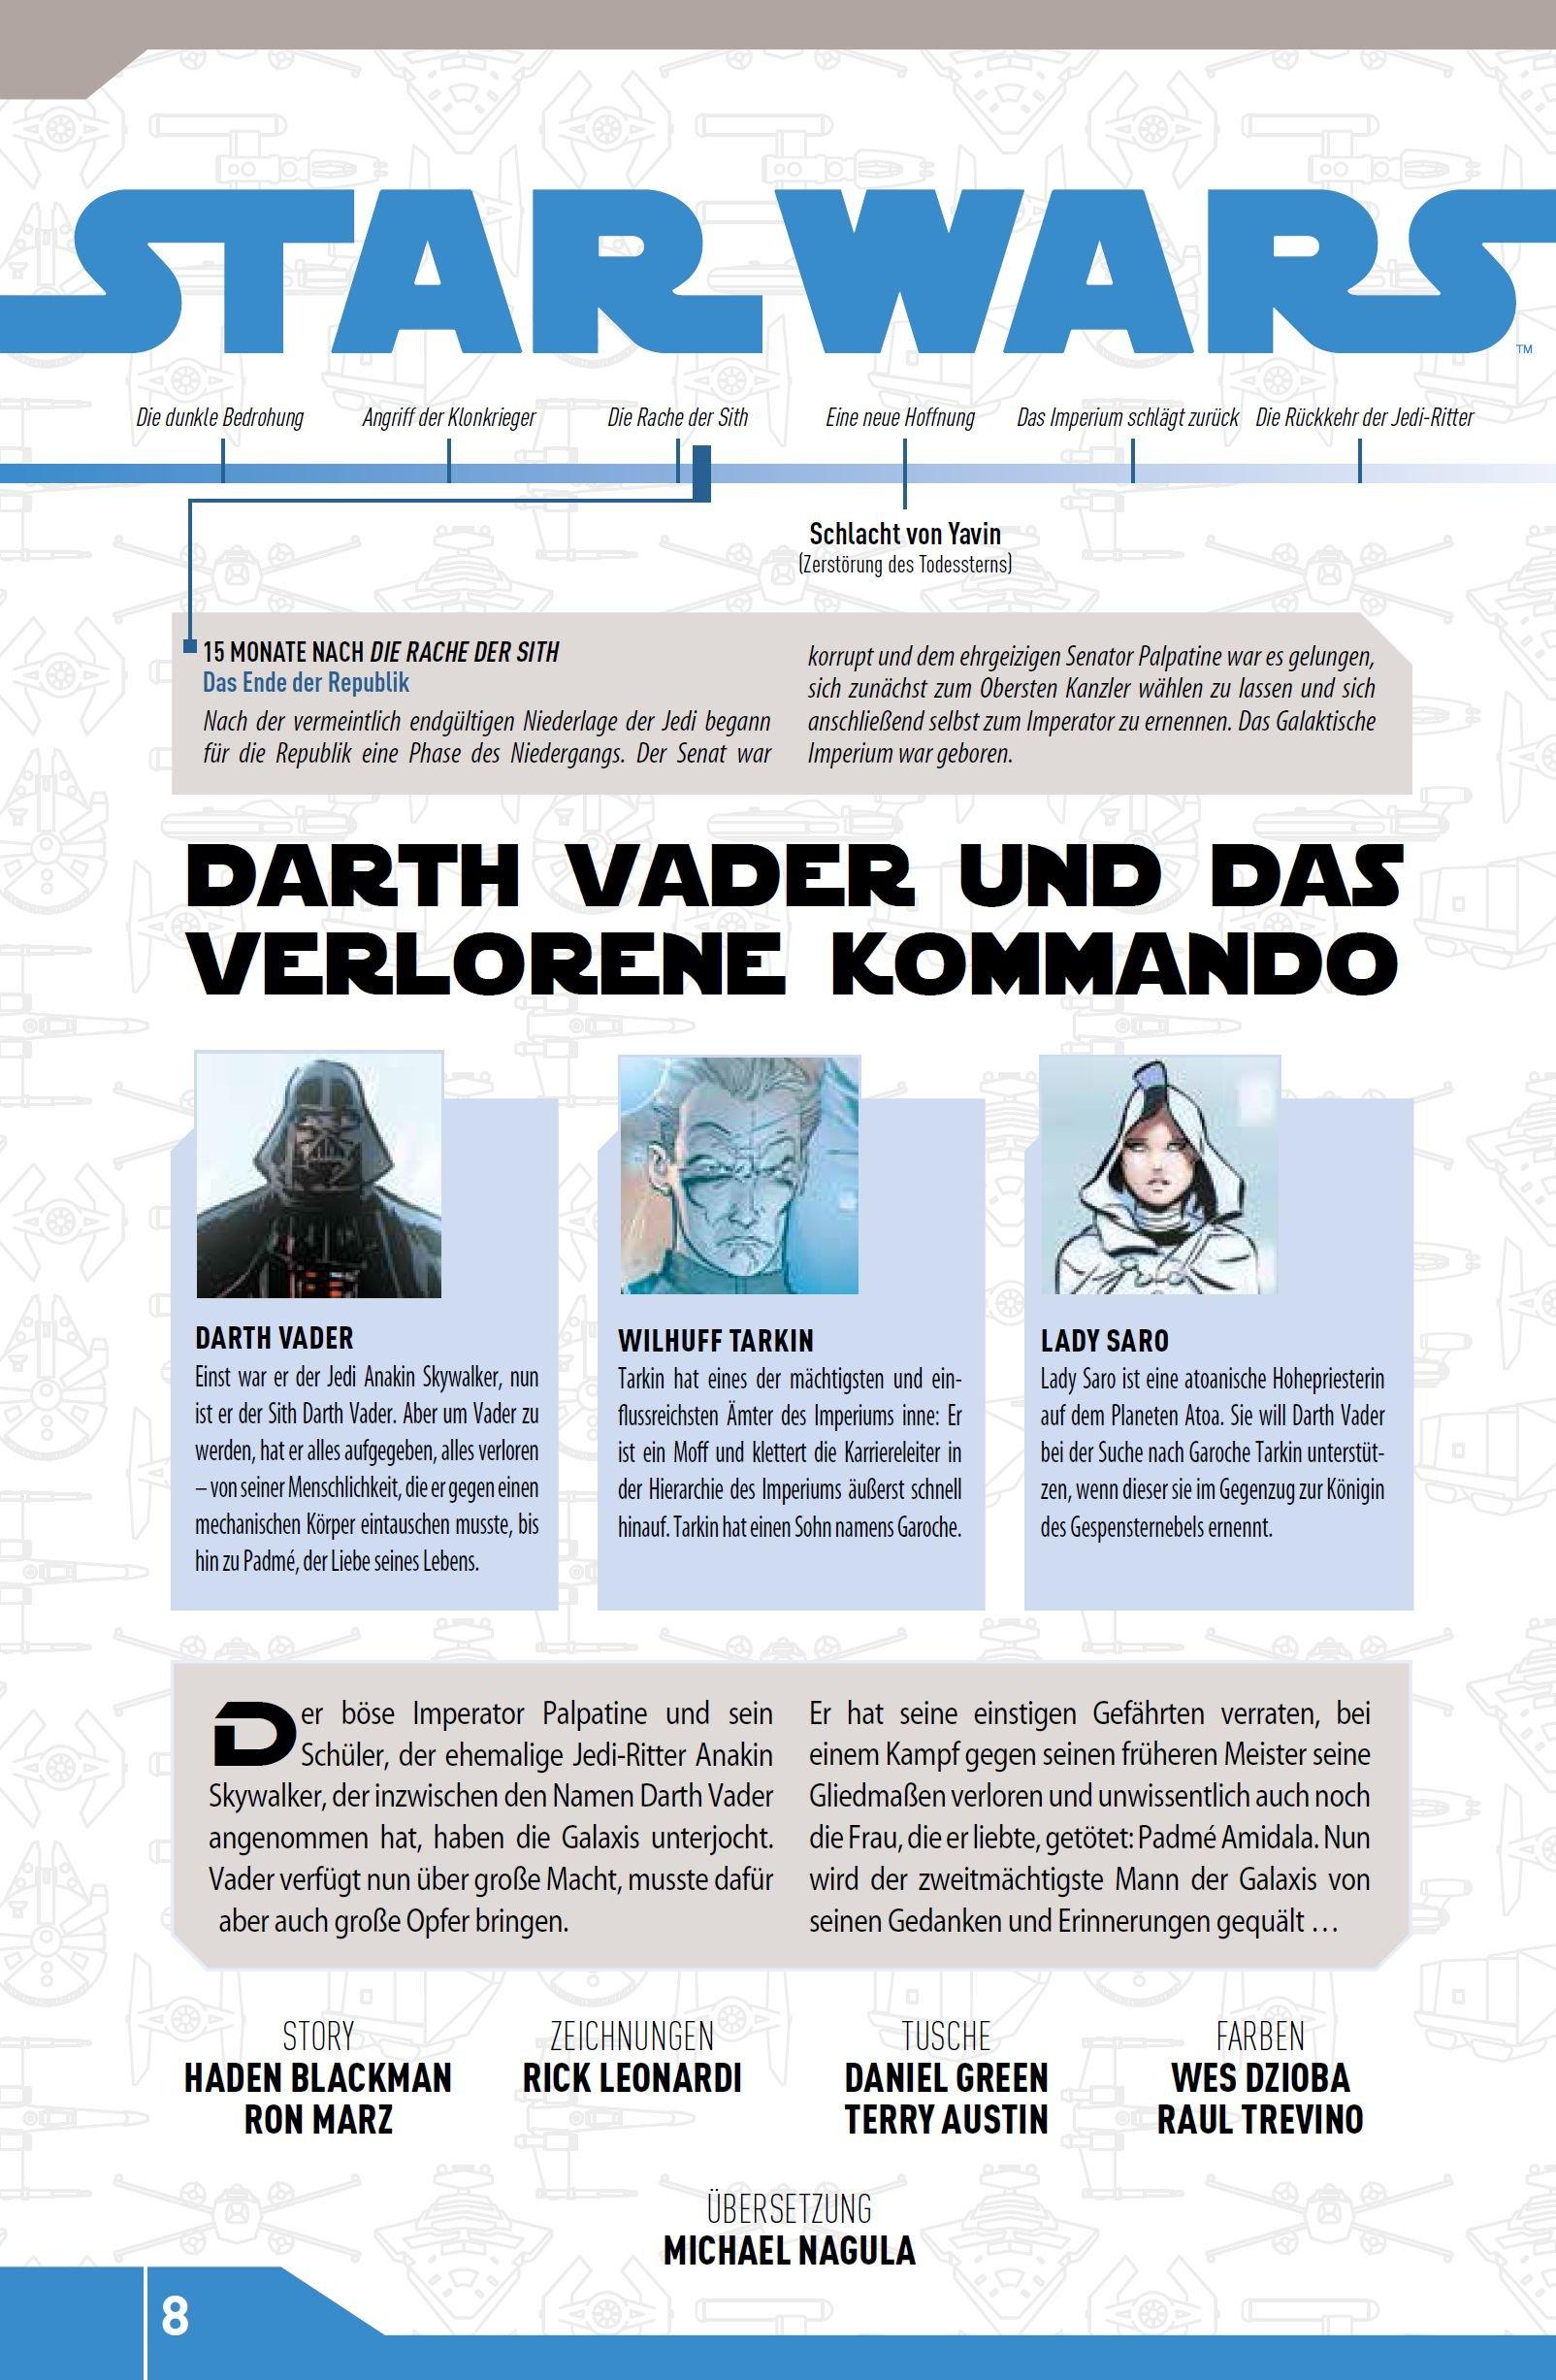 Star Wars Comic-Kollektion, Band 9: Darth Vader und das verlorene Kommando - Bonusmaterial 2